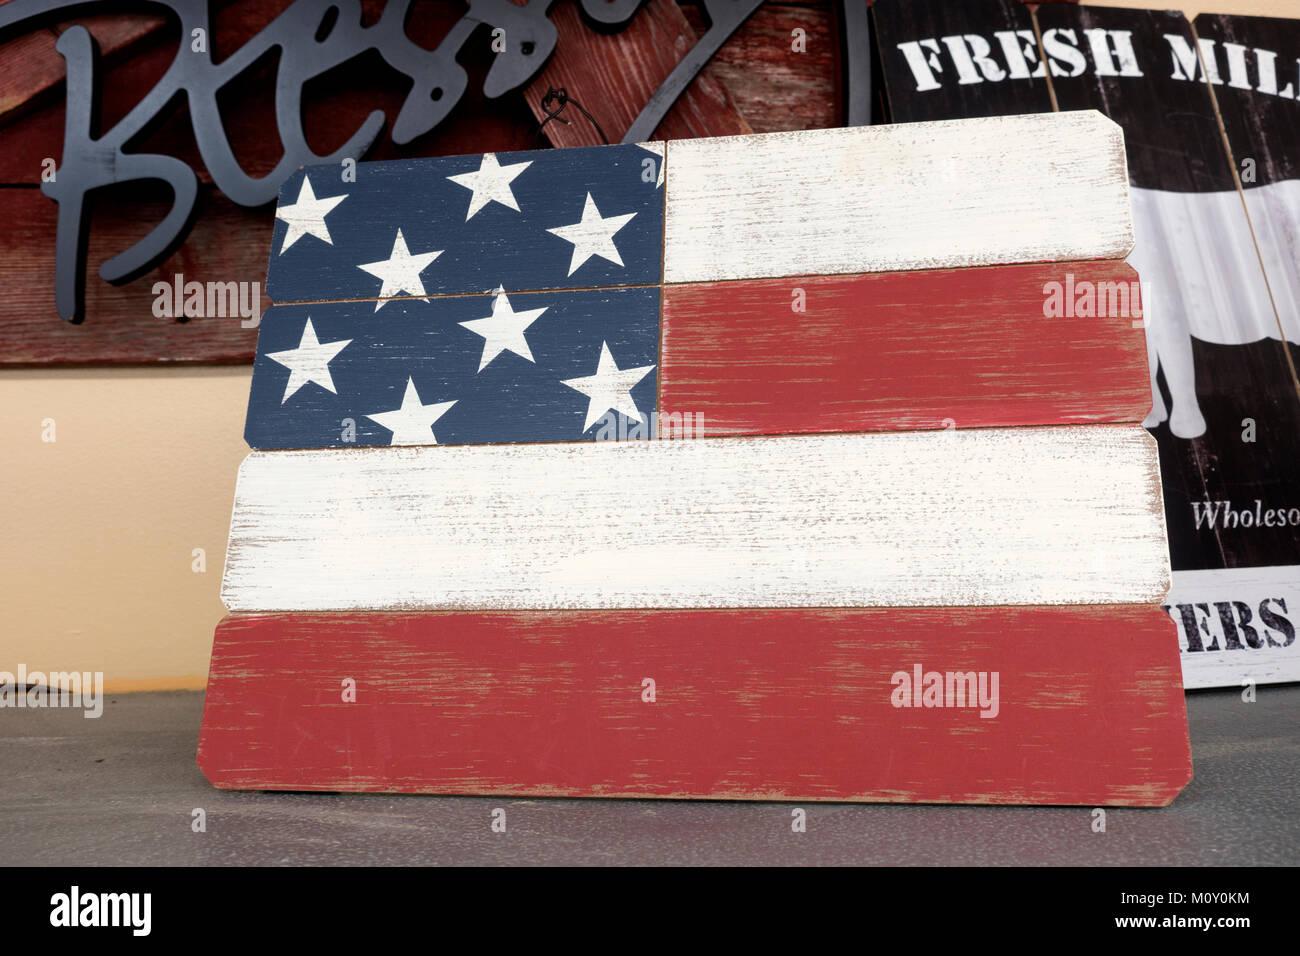 America American Display Stock Photos Amp America American